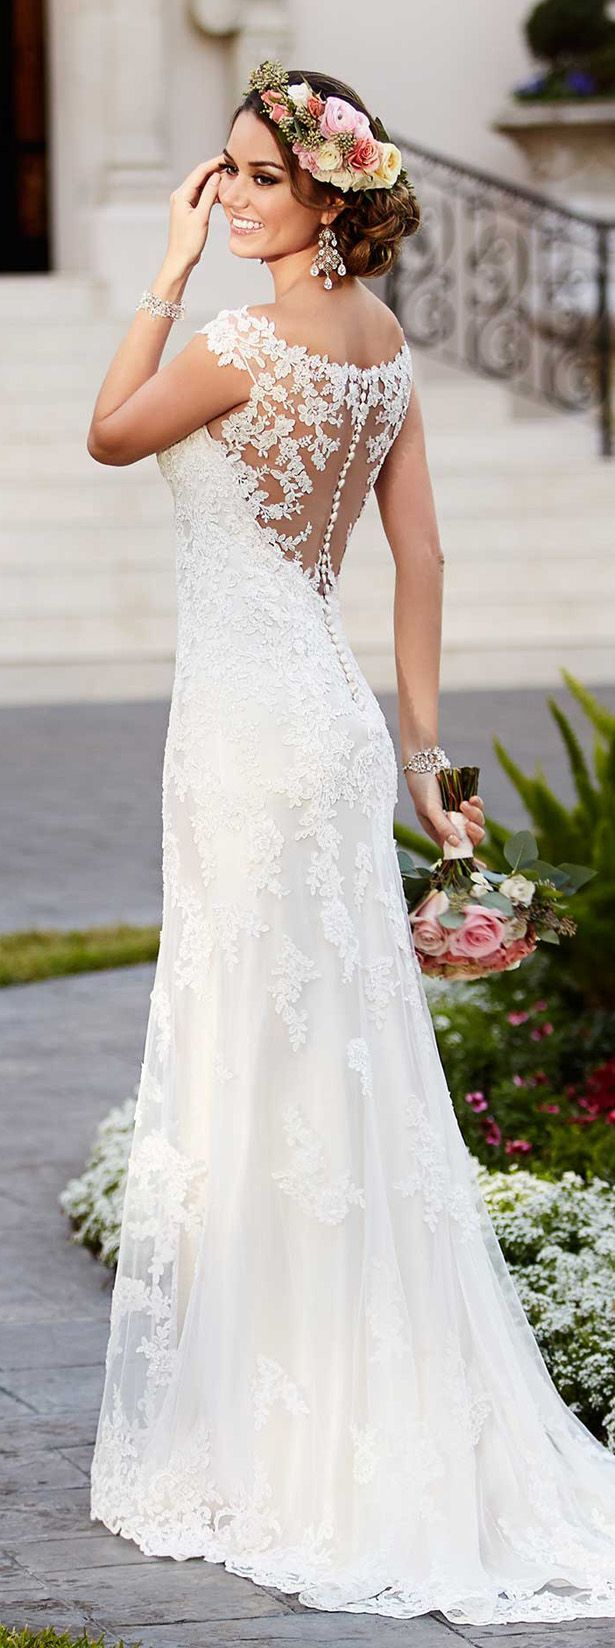 stunning wedding dresses designer mermaid ball gown 2016-2017